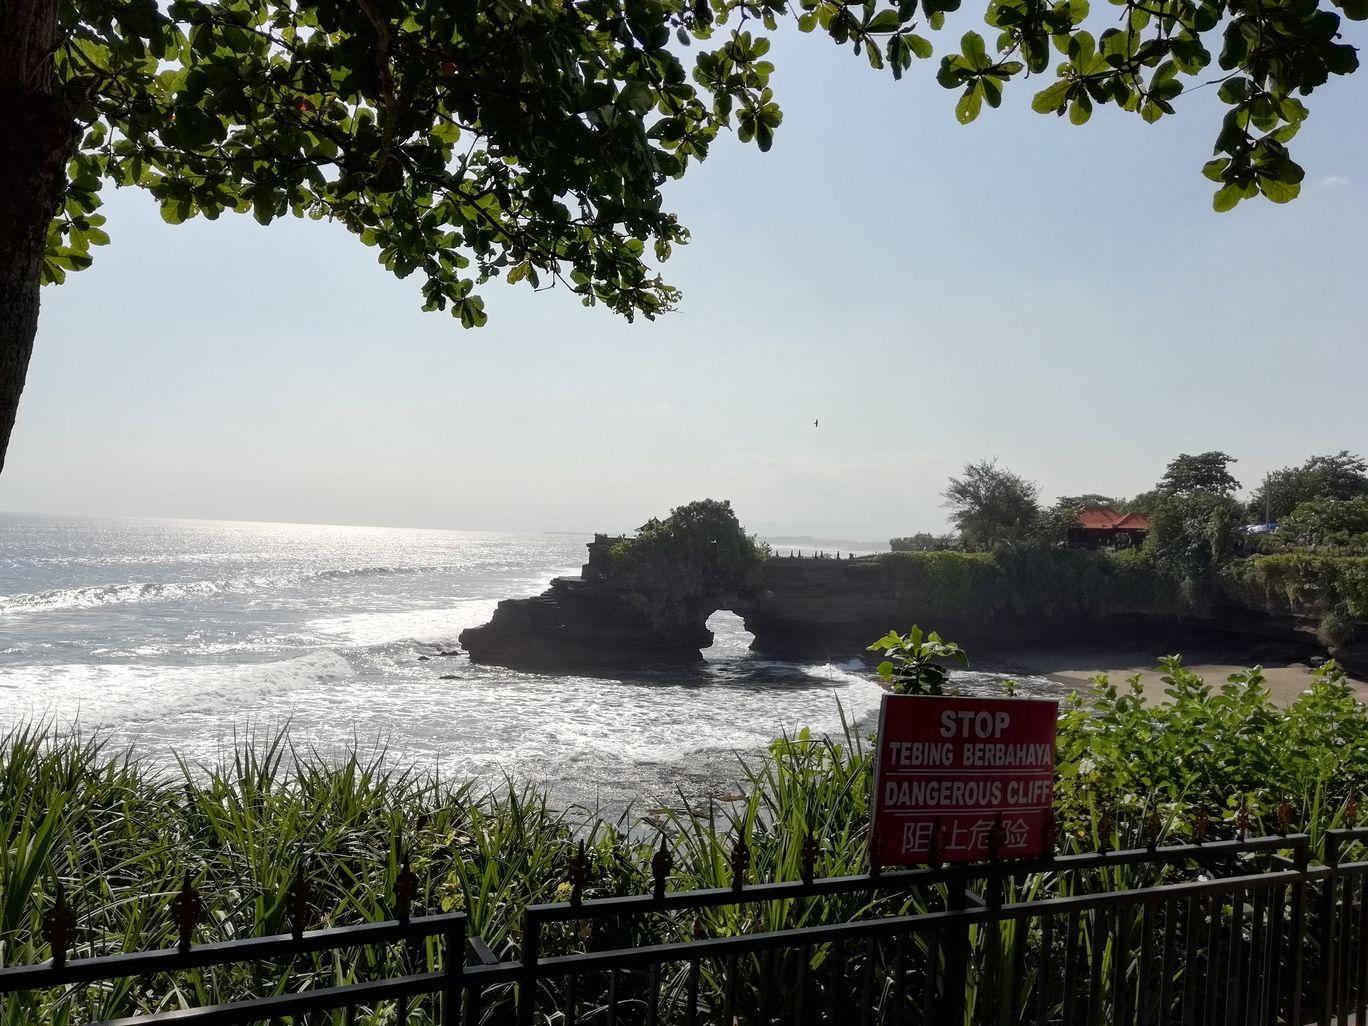 Photo of Bali By Devwrish Purwar